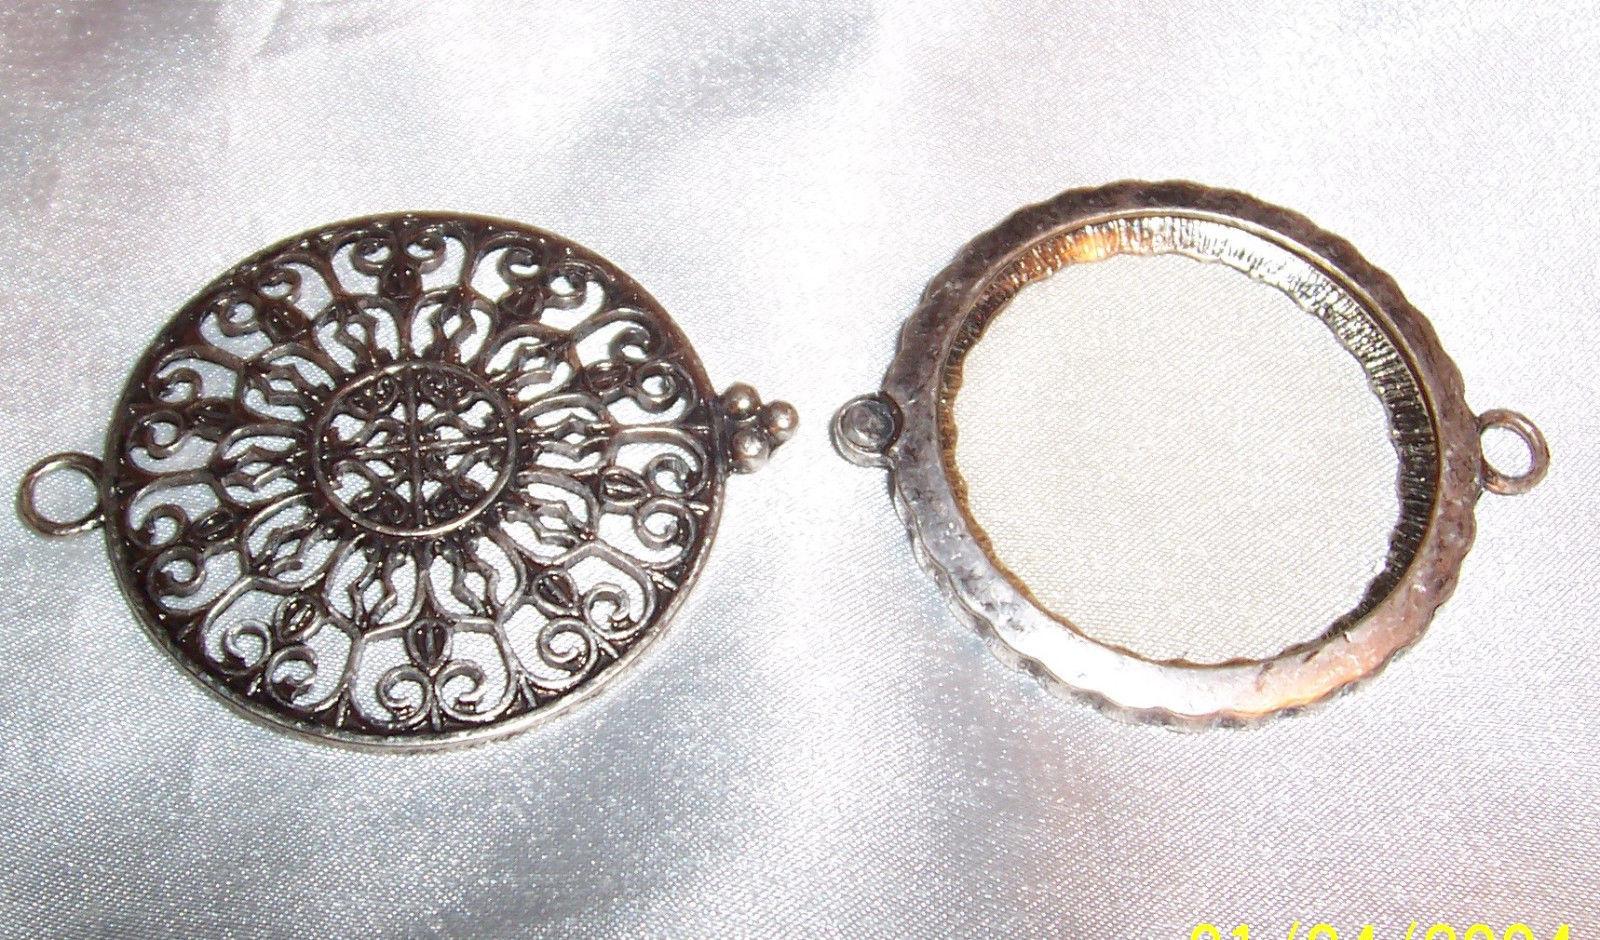 ORNATE MAGNIFYING GLASS PENDANT Antique Victorian NOUVEAU / Unmarked